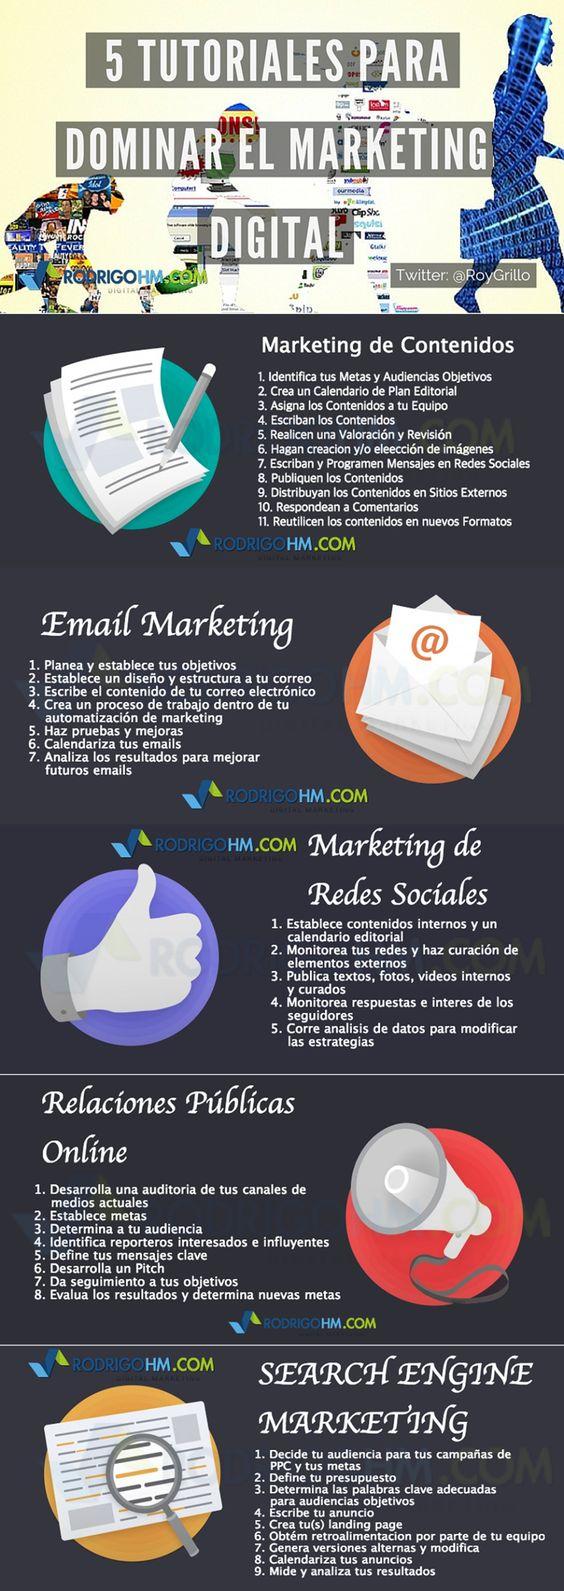 5 tutoriales para dominar el Marketing Online #infografia #infographic #marketing